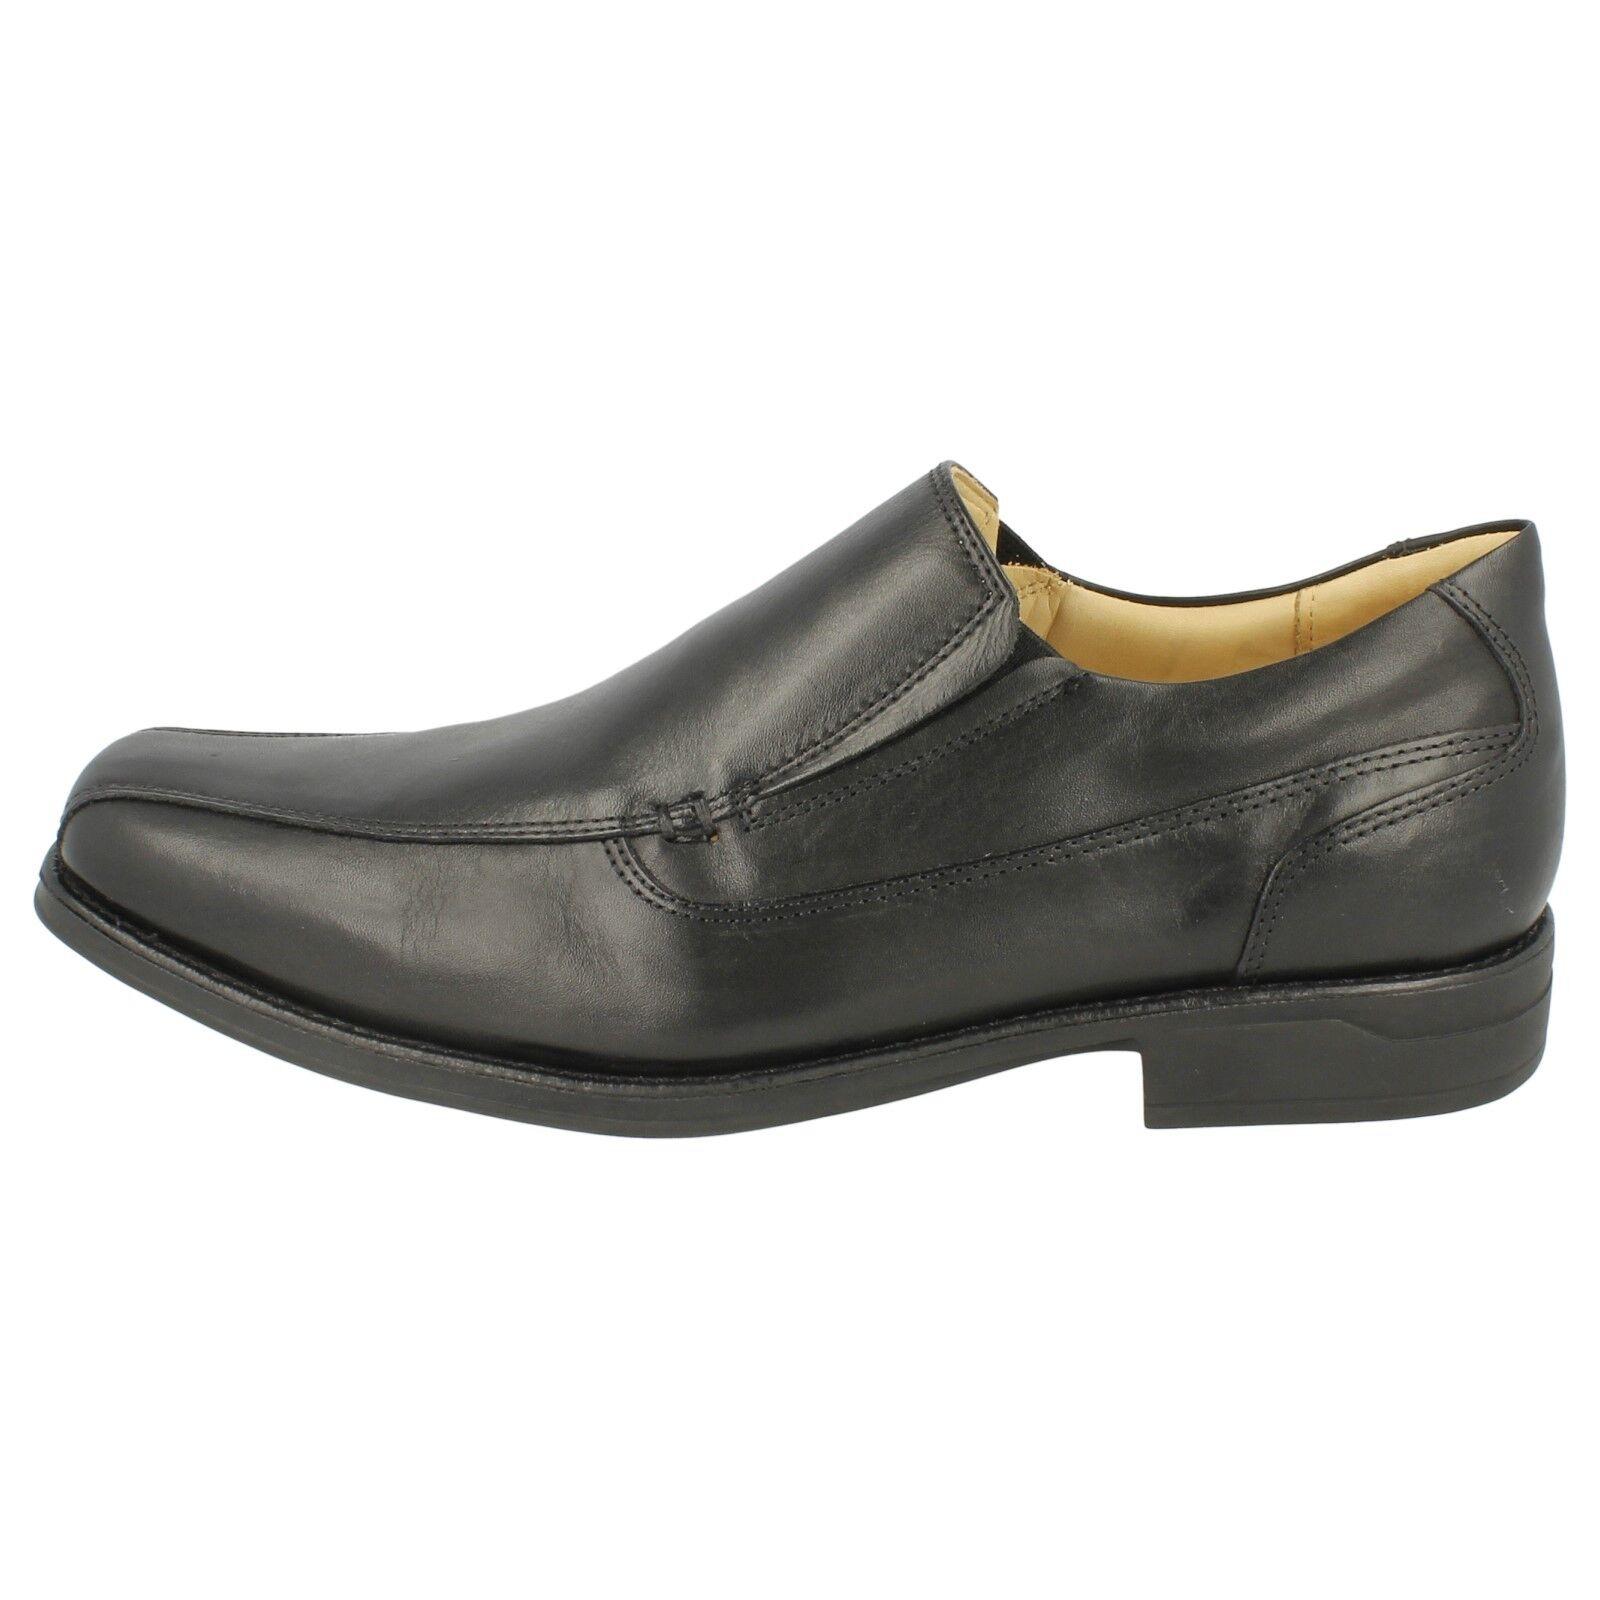 Mens Anatomic Leather & Co Poloni Black Leather Anatomic Smart Slip On Shoes e5f2f2